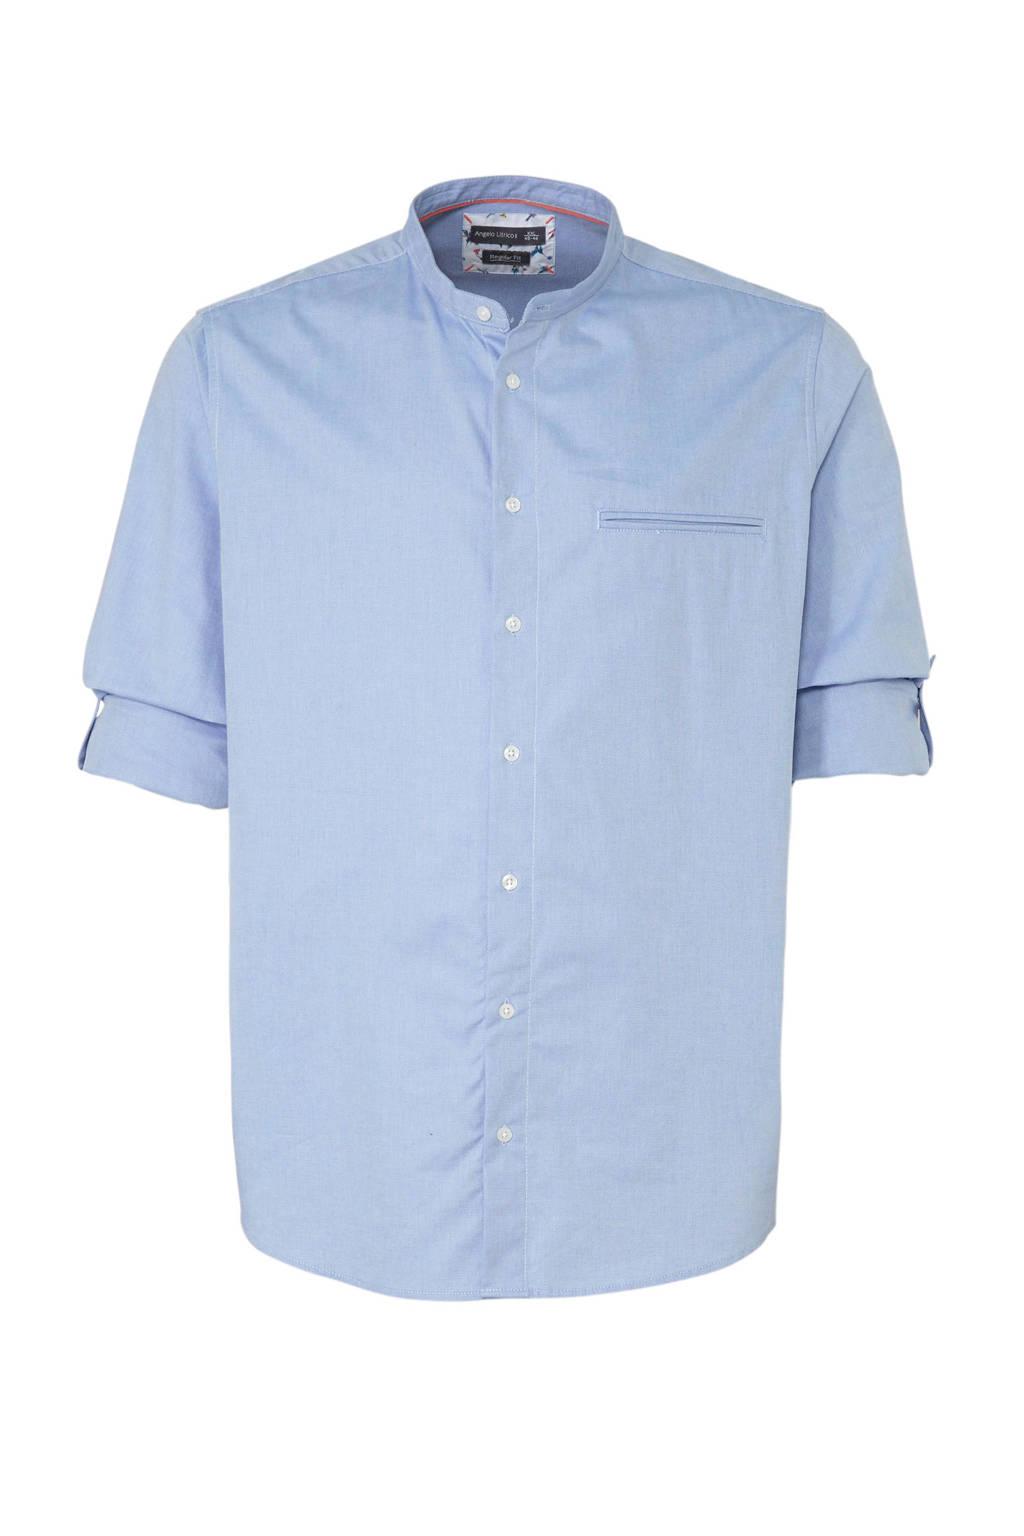 C&A XL Angelo Litrico regular fit overhemd blauw, Blauw